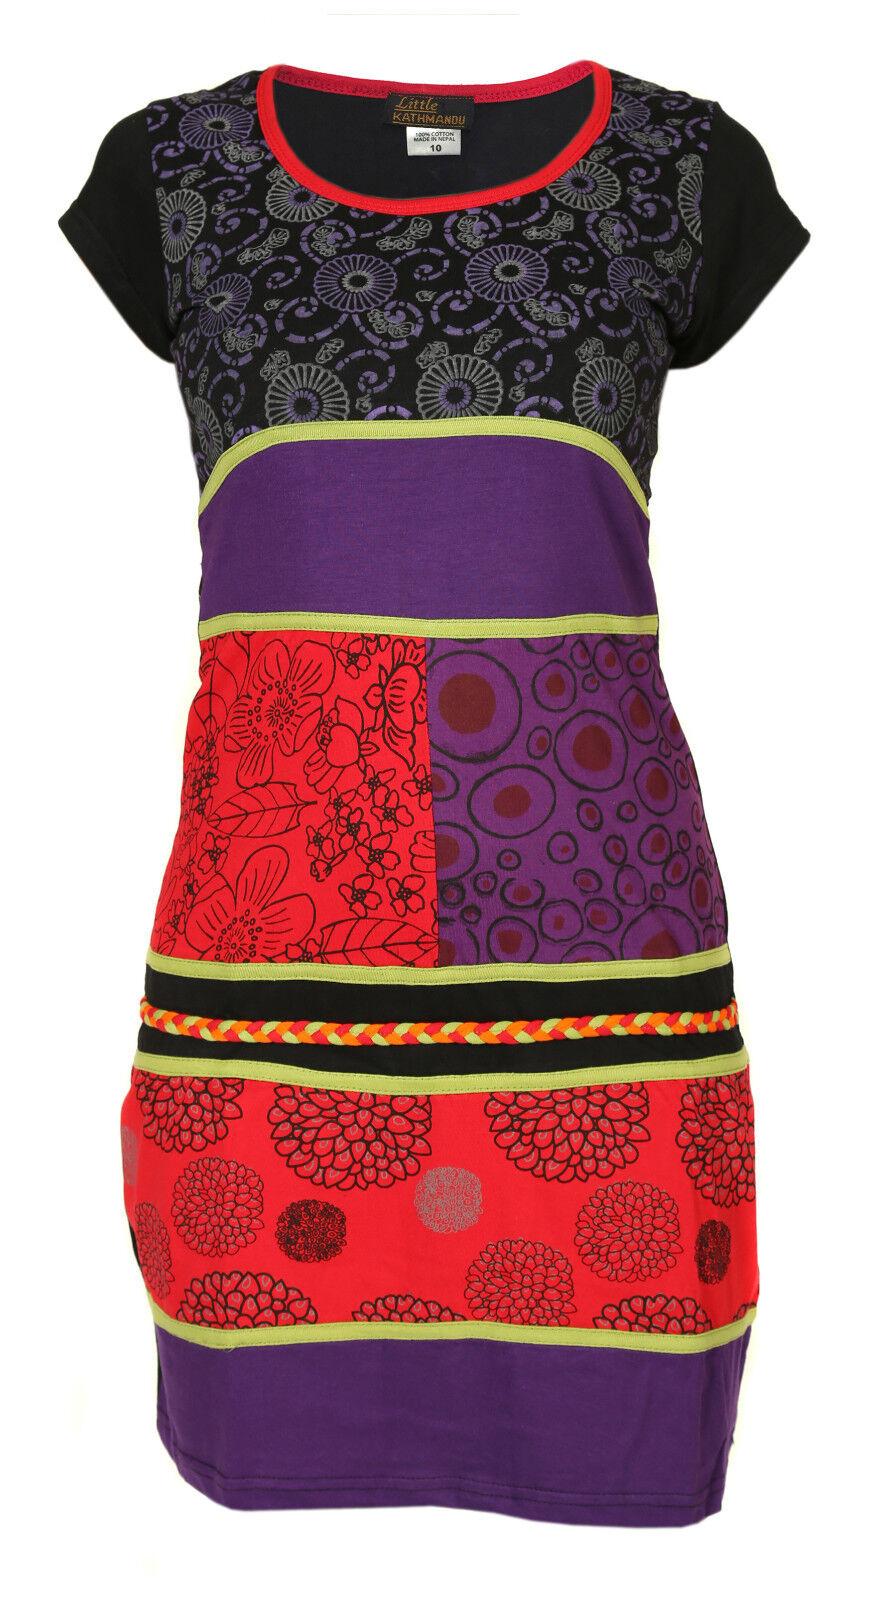 Artigianale Cotone Hippie NATURALE Kathmandu abito abito abito boho rétro patchwork ccd6dd